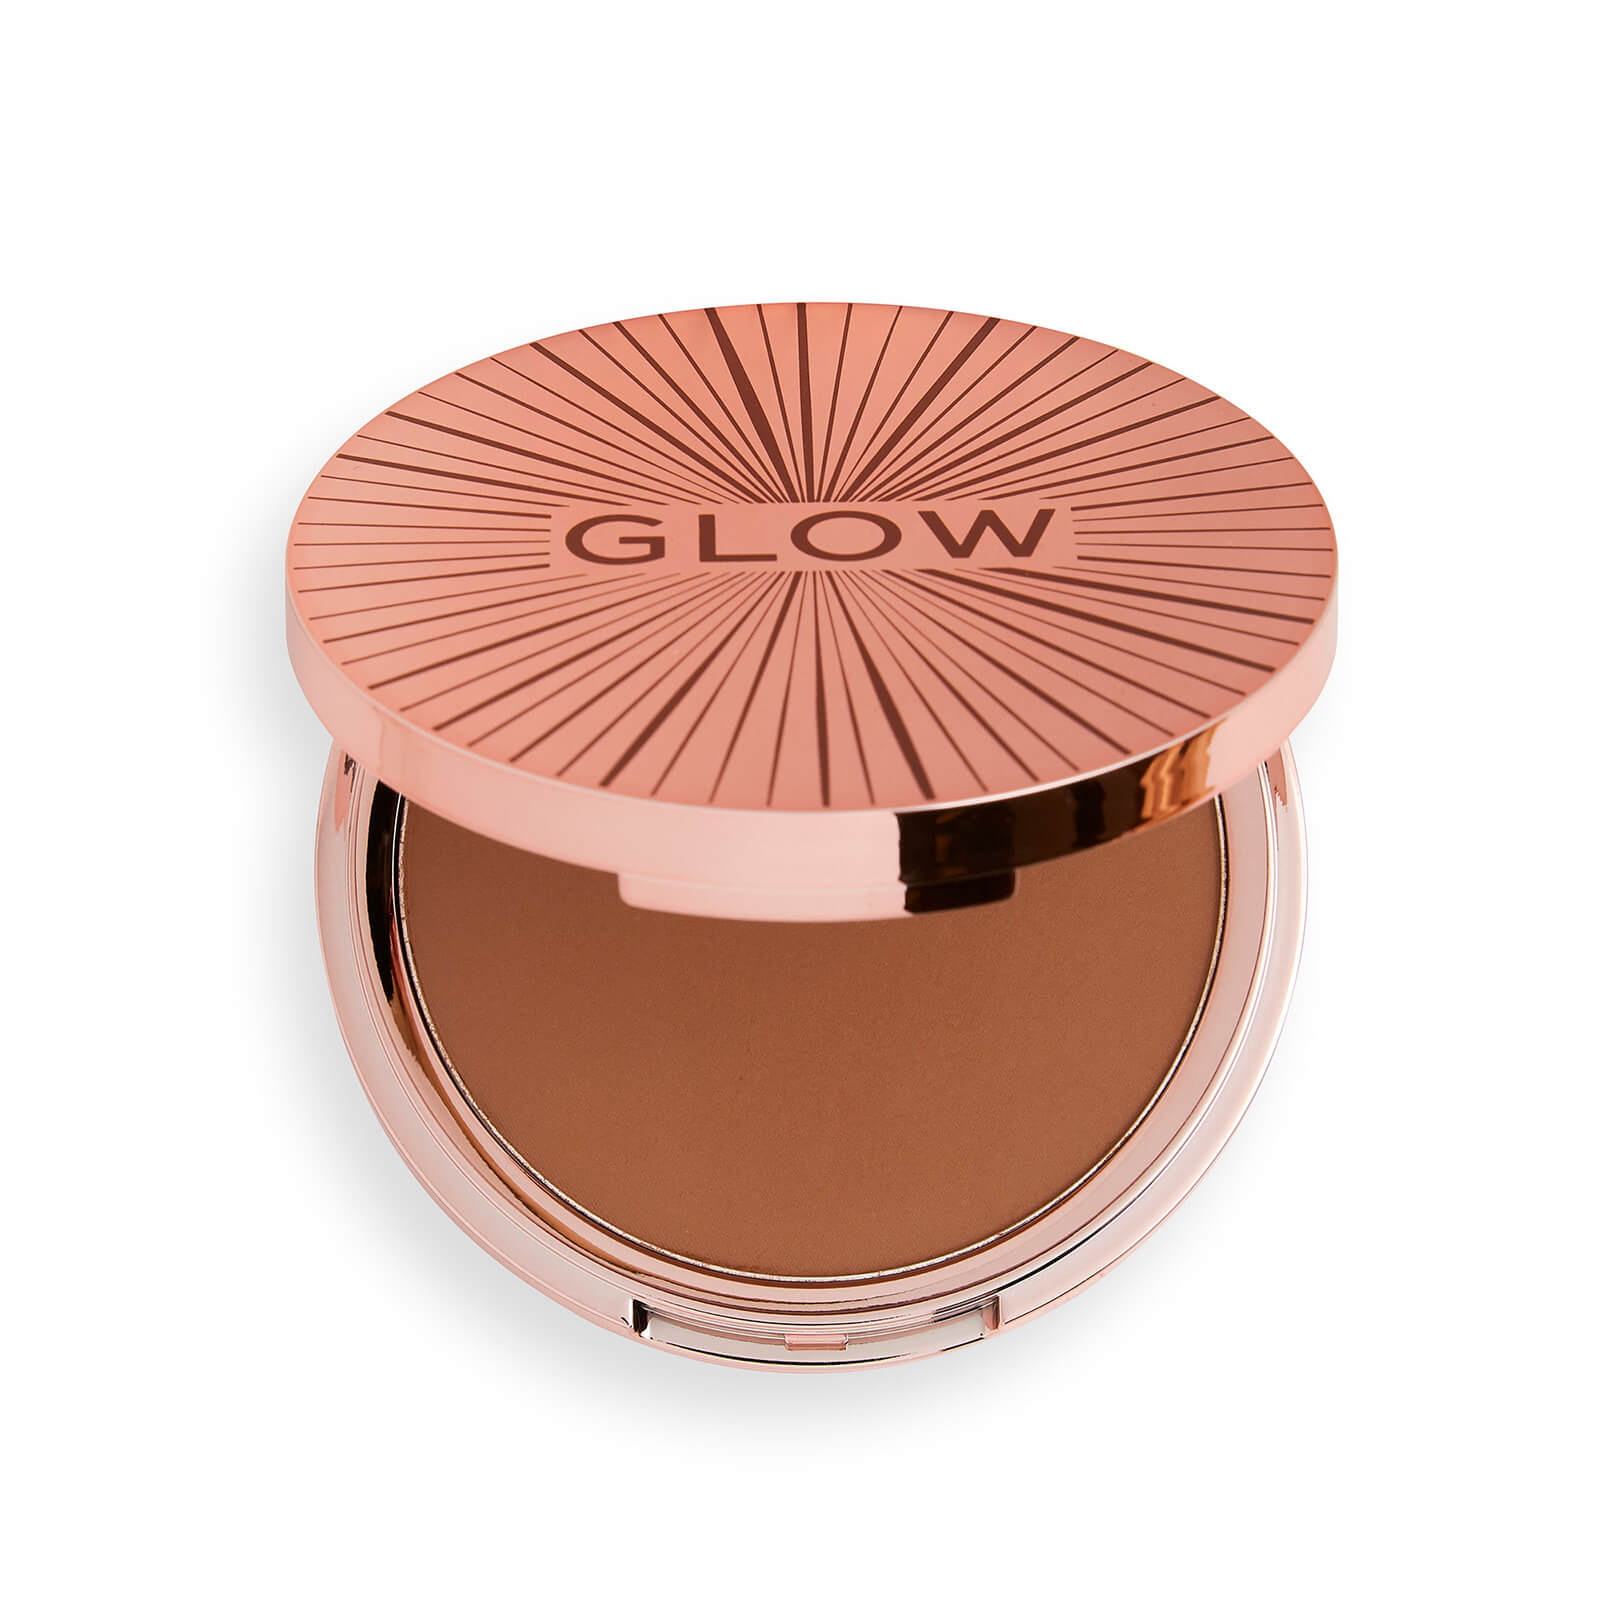 Купить Revolution Glow Splendour Bronzer (Various Shades) - Light